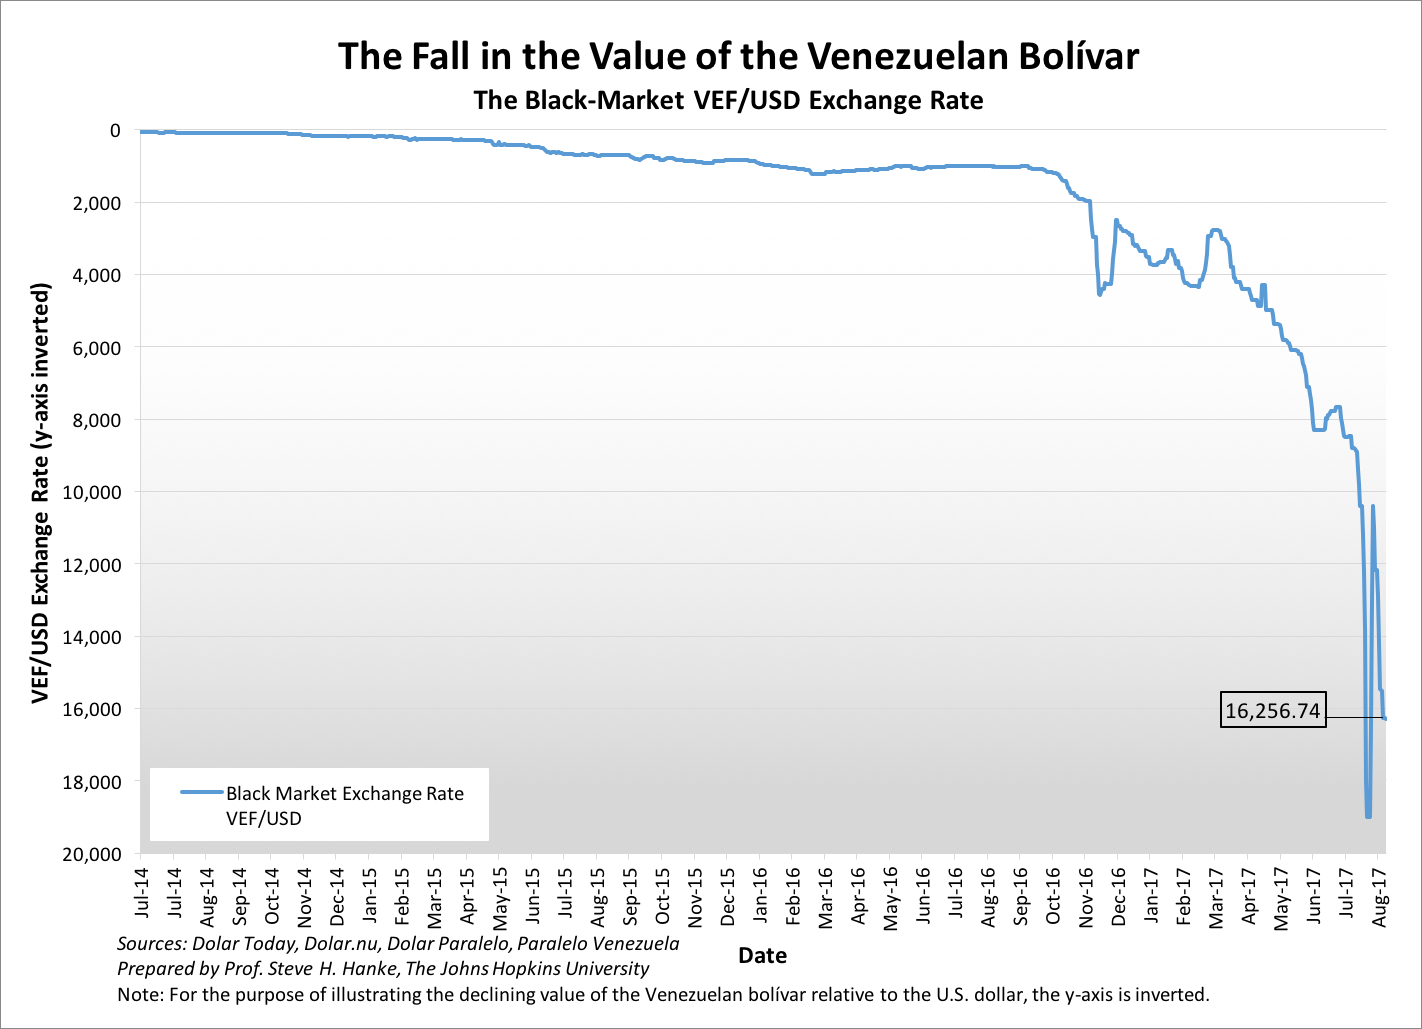 decline of Venezuelan Bolivar fiat currency